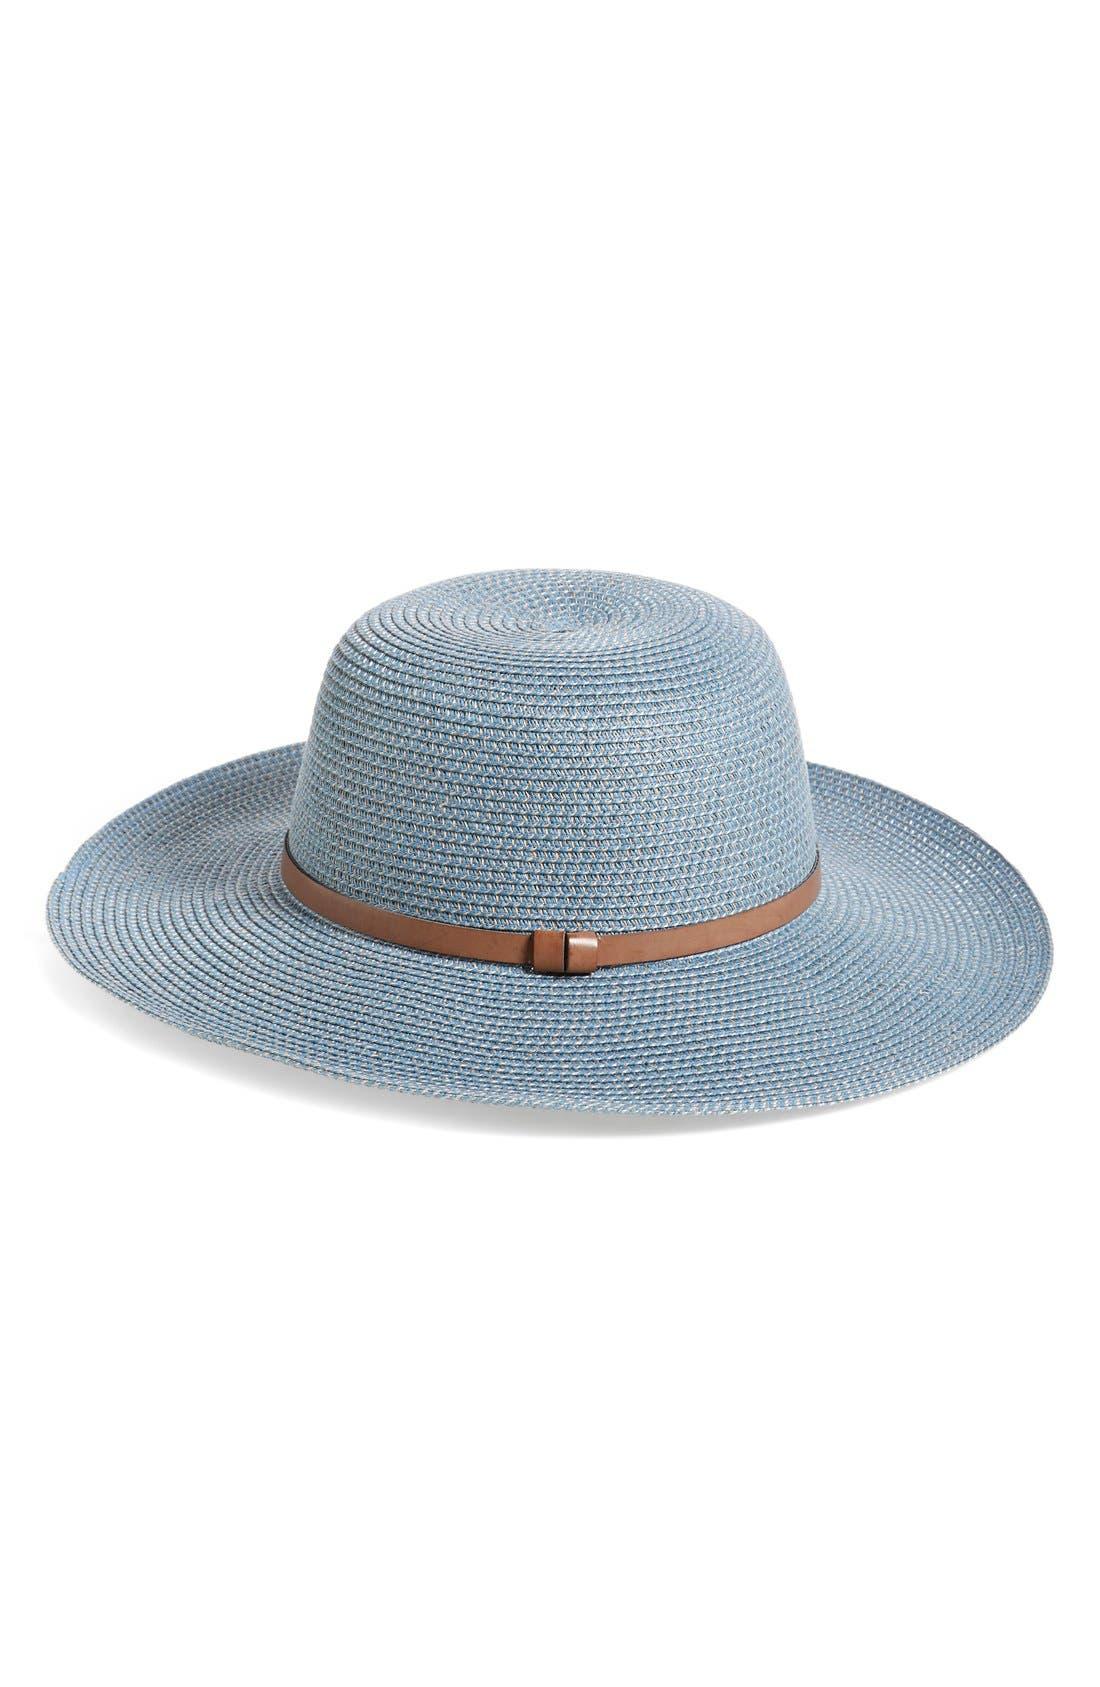 Alternate Image 1 Selected - Nordstrom Straw Floppy Hat